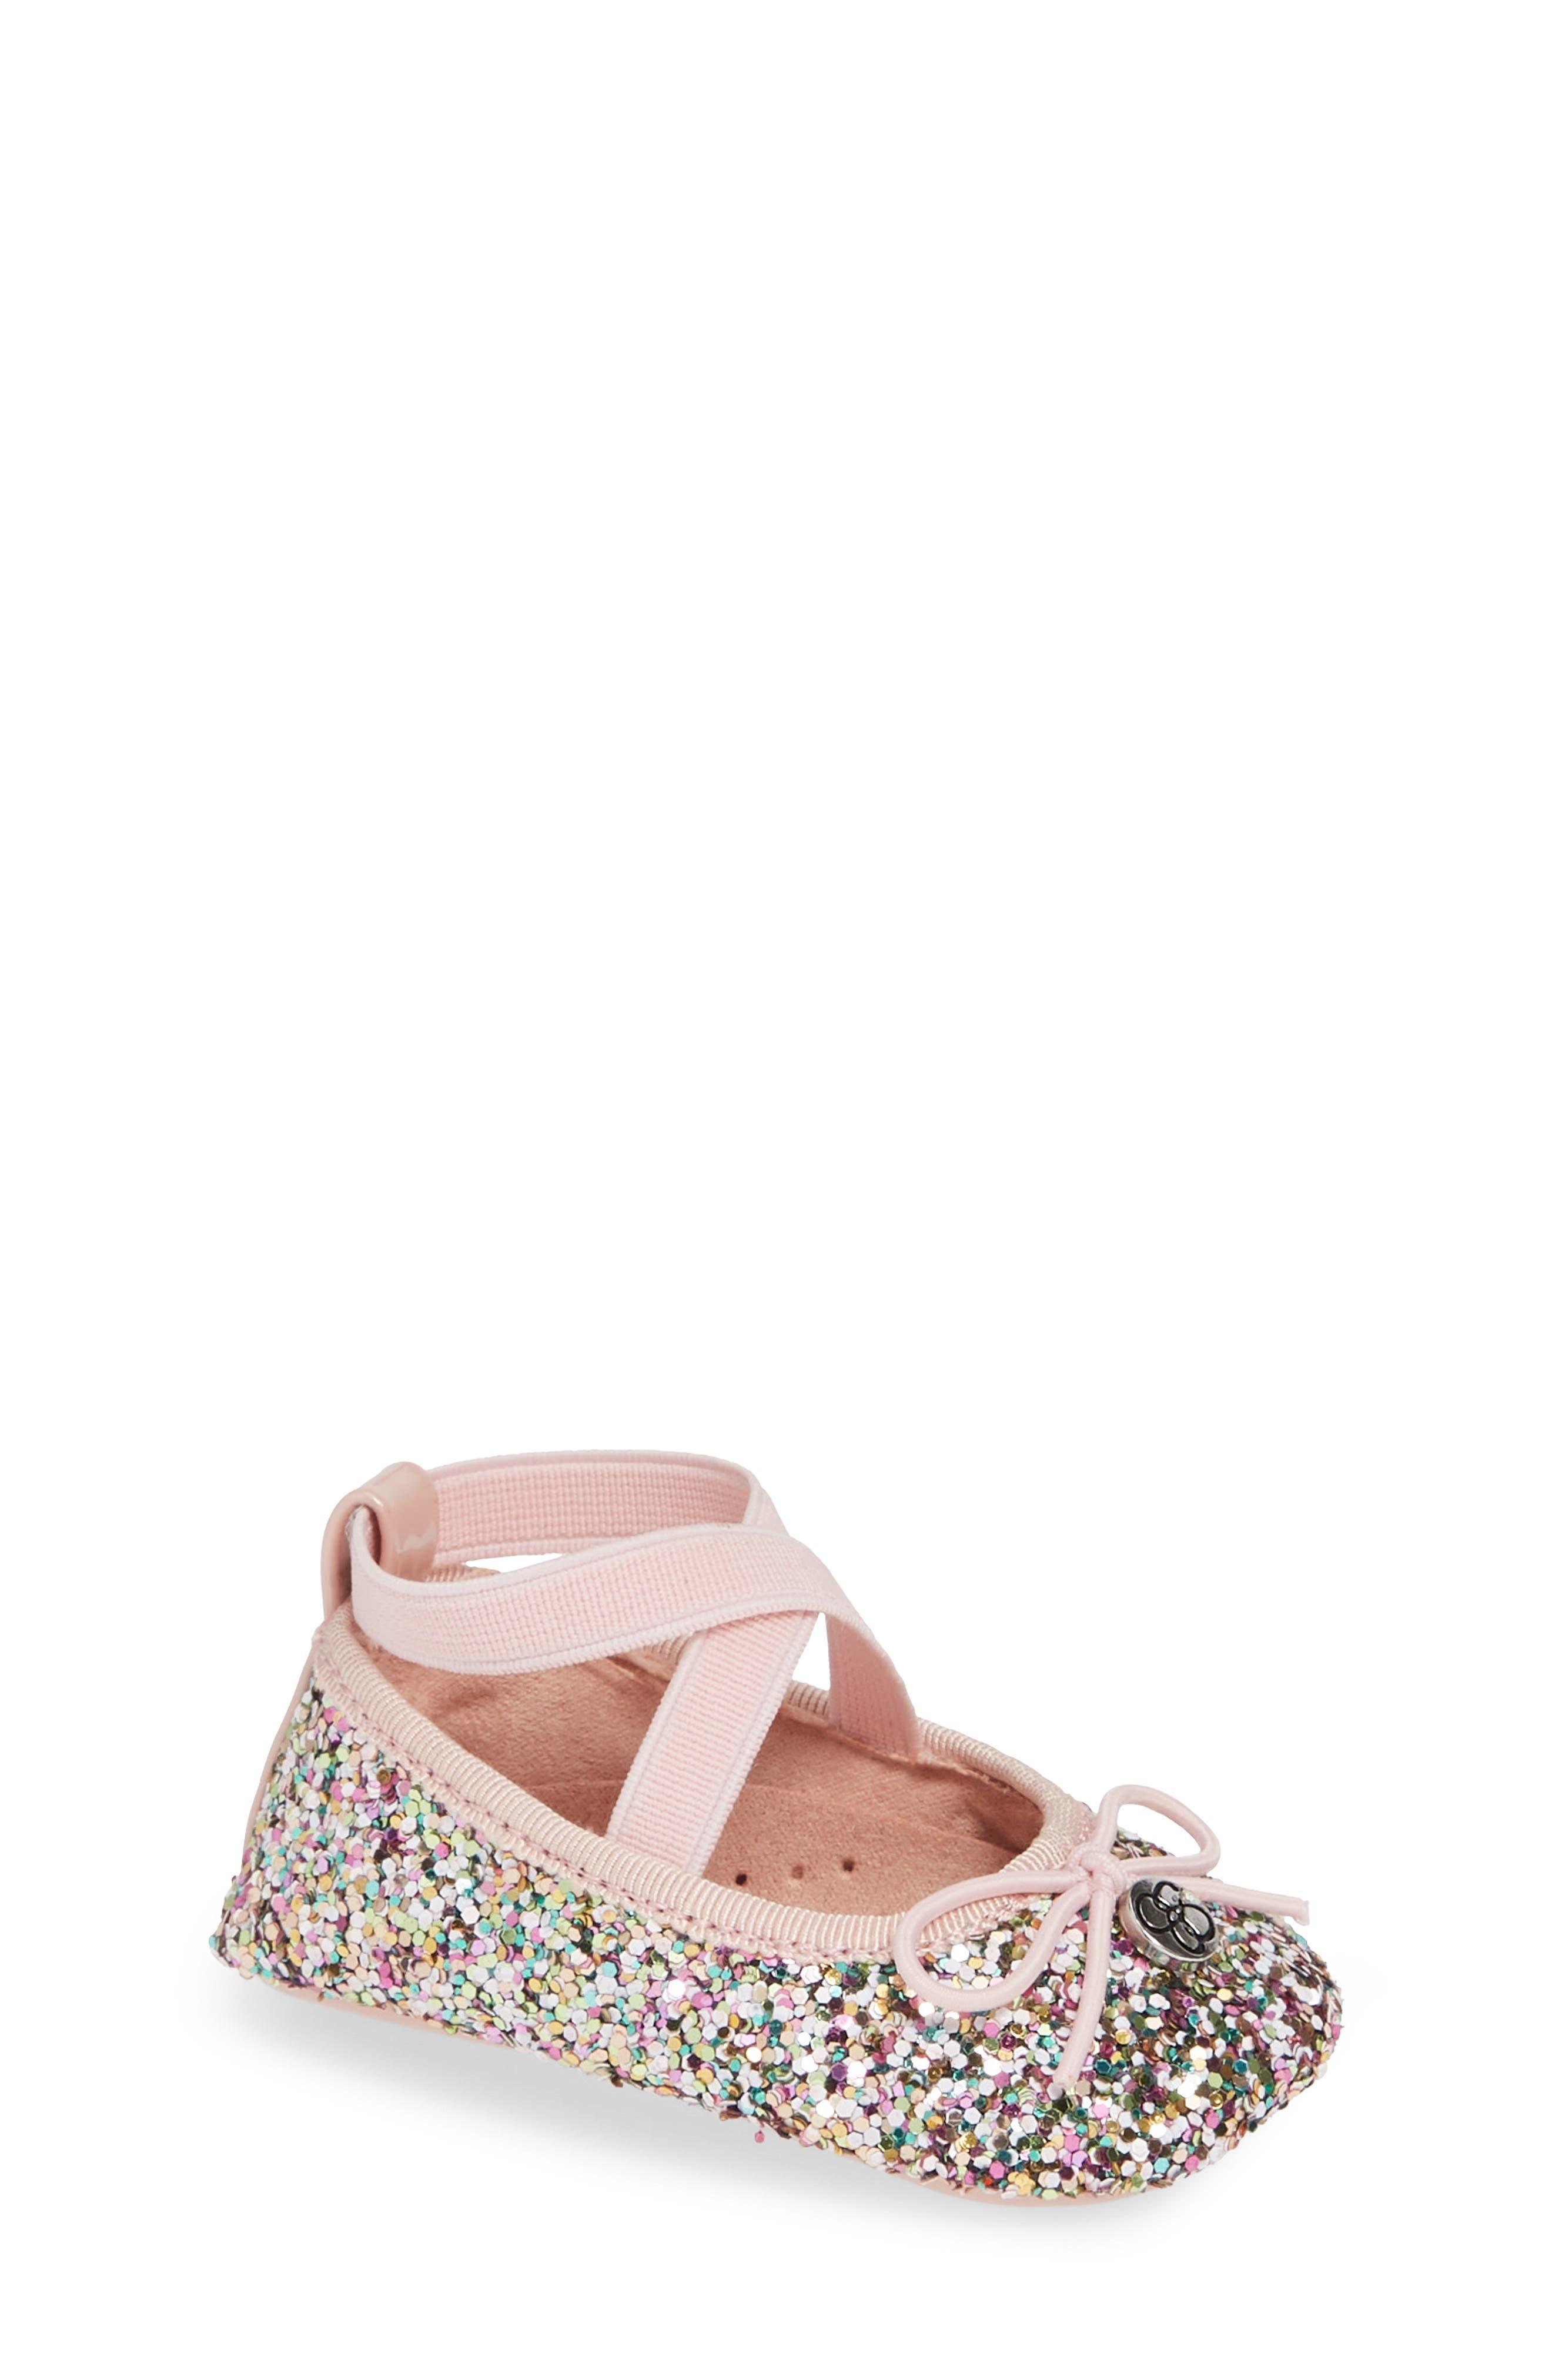 JESSICA SIMPSON Glitter Mary Jane Crib Shoe, Main, color, 650